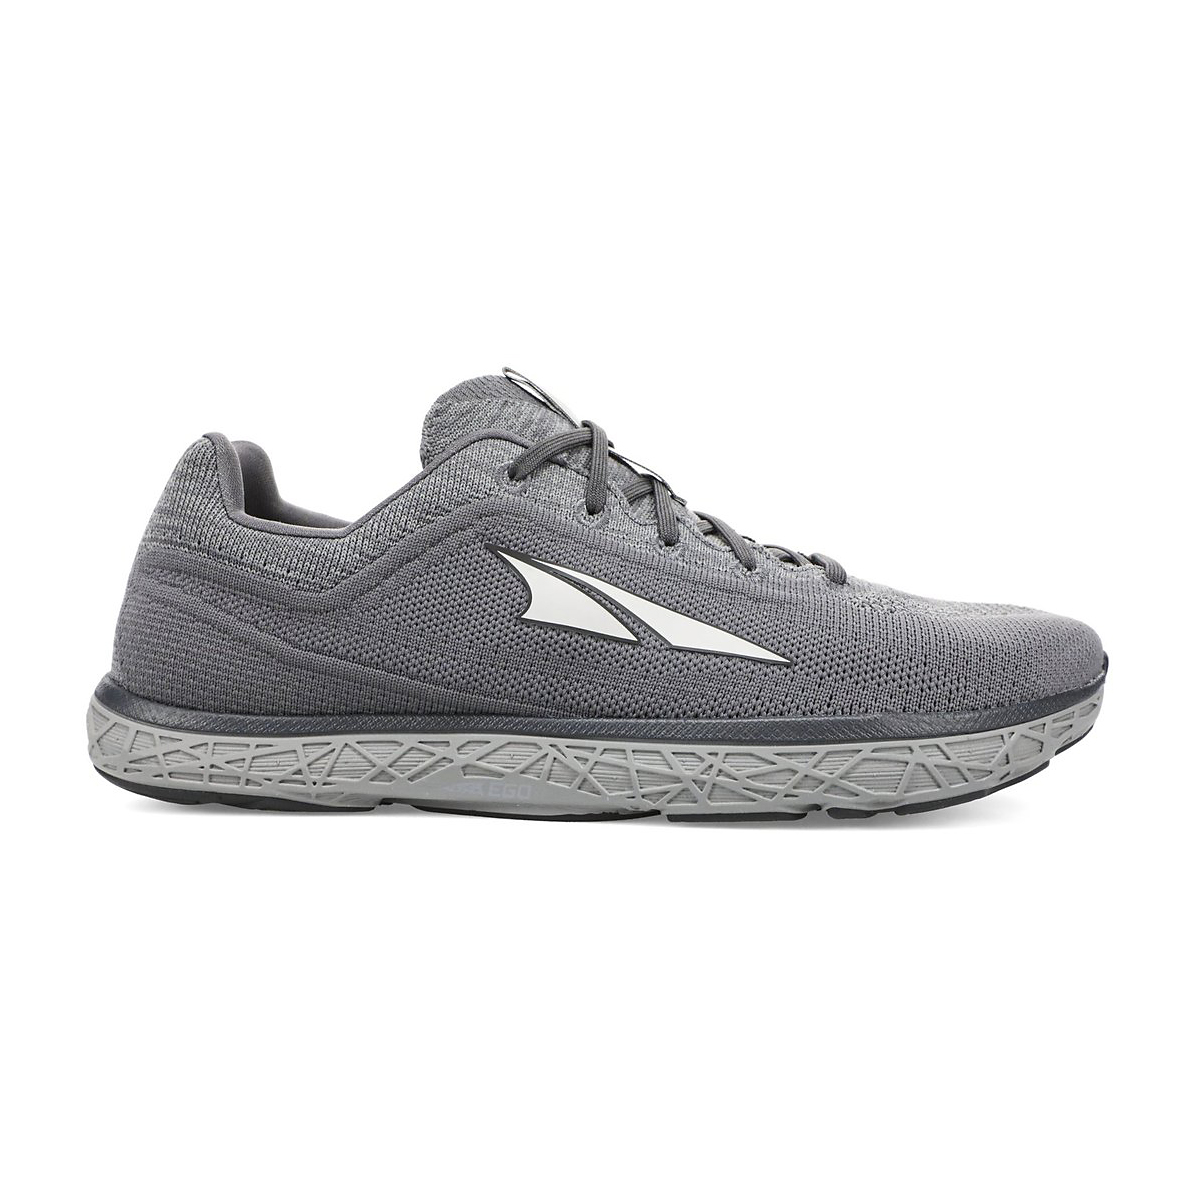 Men's Altra Escalante 2.5 Running Shoe - Color: Gray - Size: 7 - Width: Regular, Gray, large, image 1